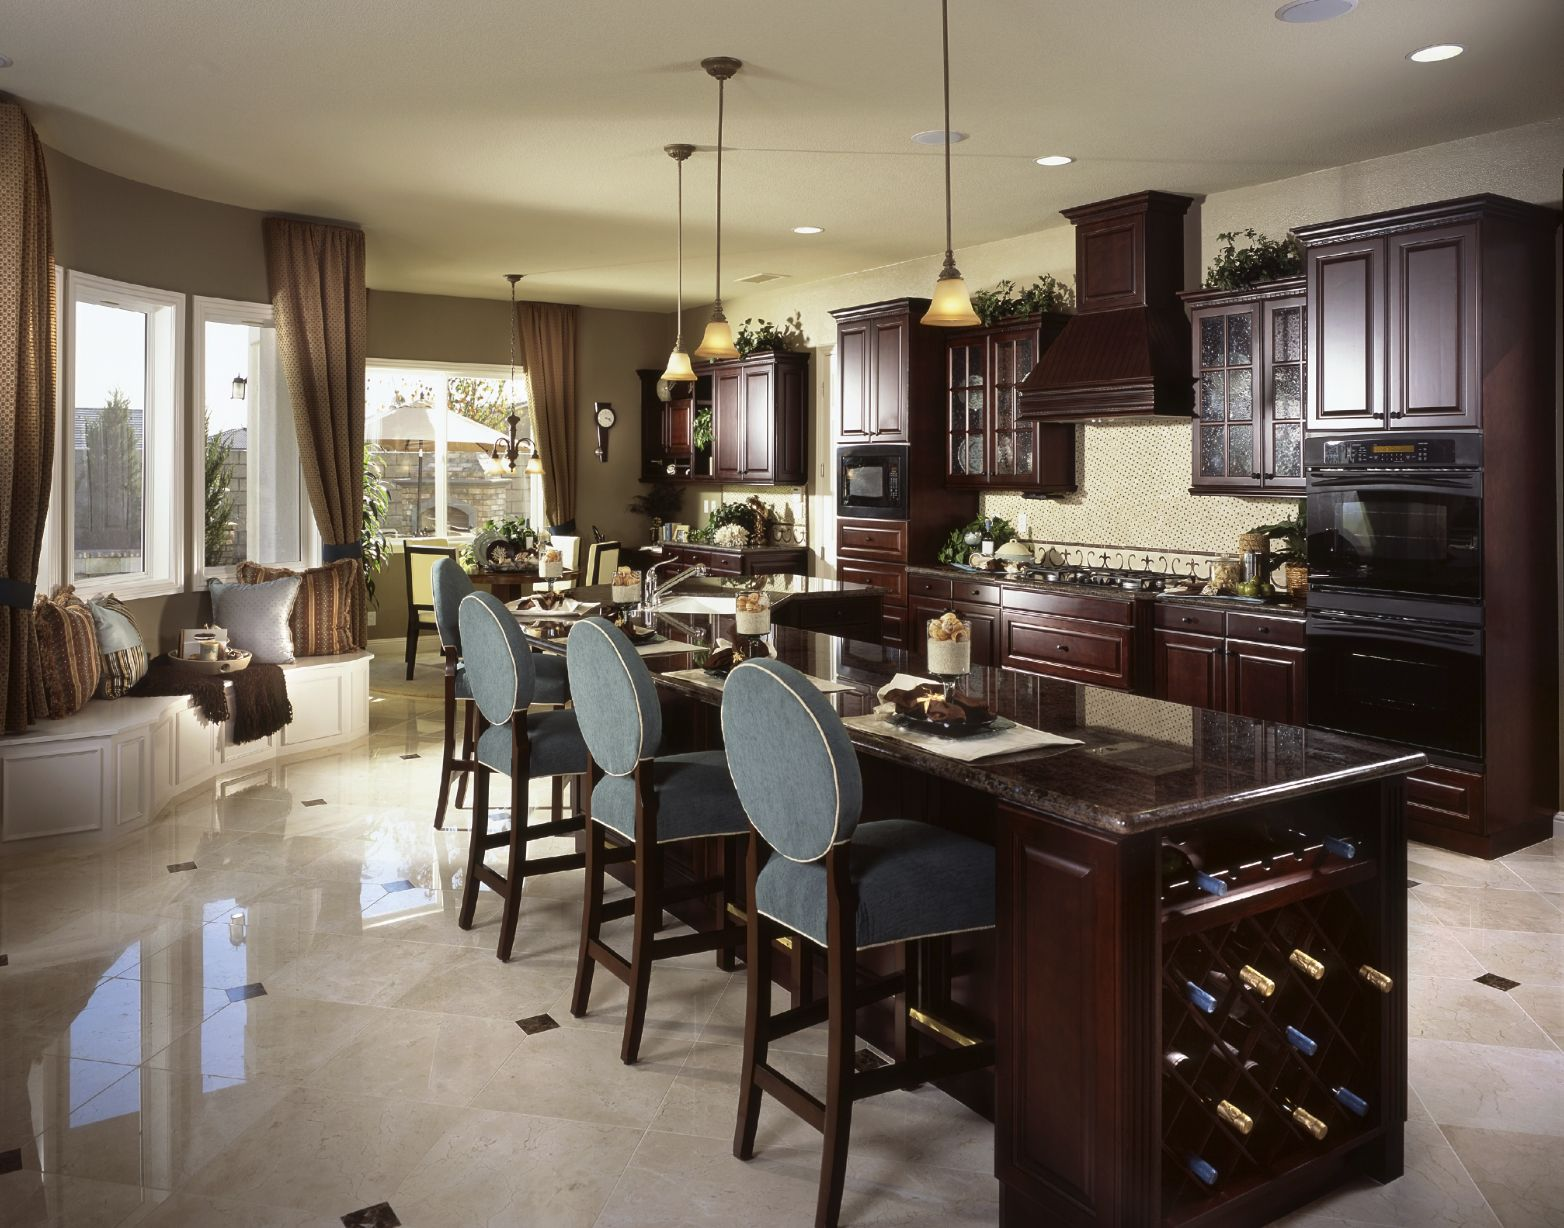 Built In Wine Rack Kitchen Cabinets Houston 399 Island Ideas 2018 Pinterest Marble